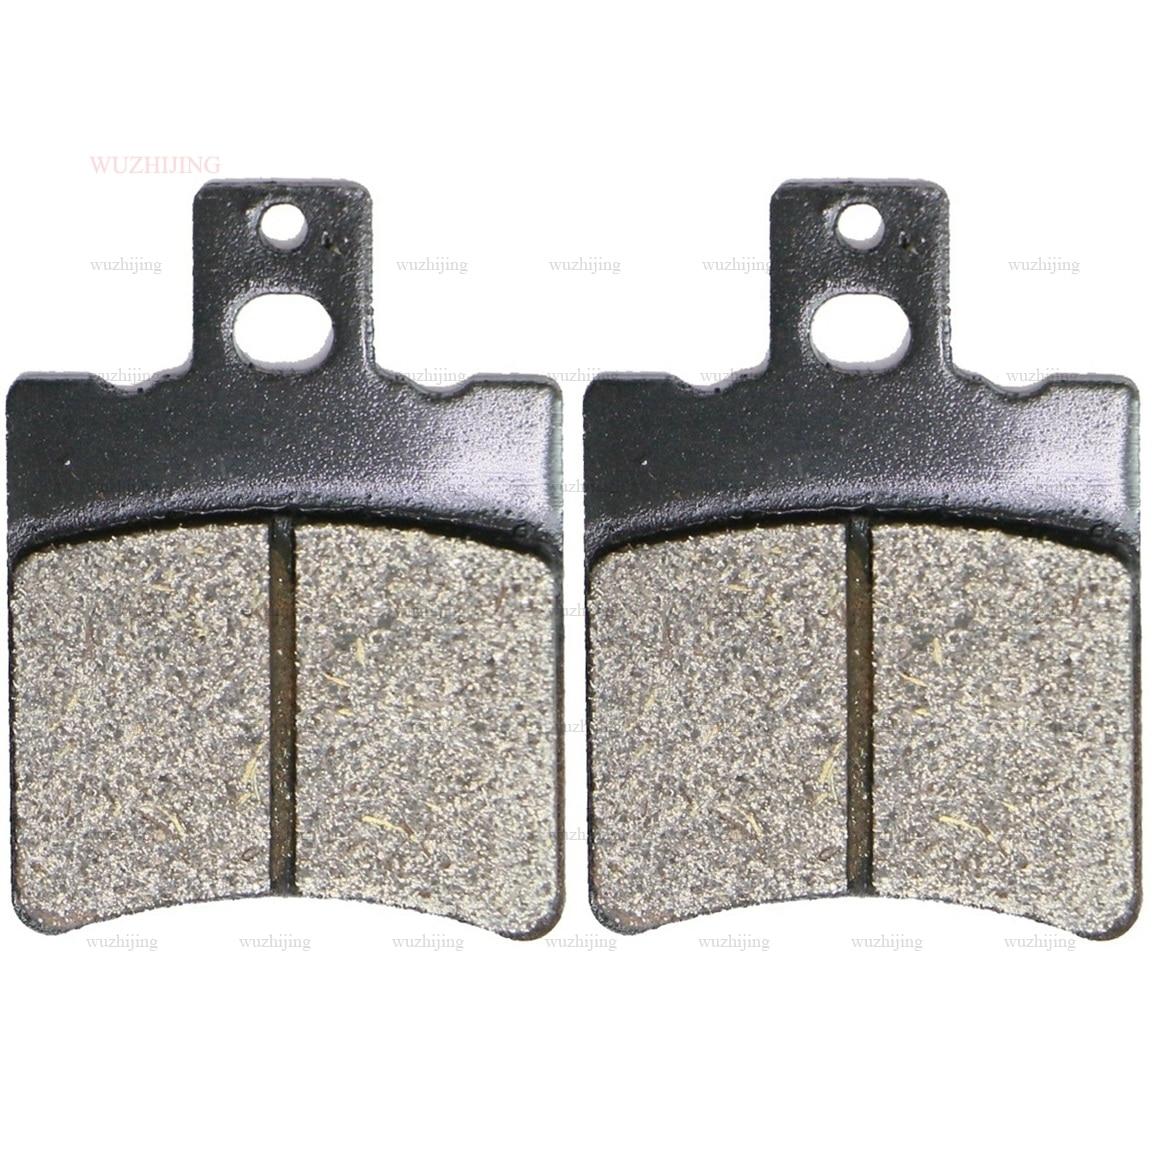 Brake Switch Fits Front /& Rear Malaguti Ciak 125 Master 2007 CC